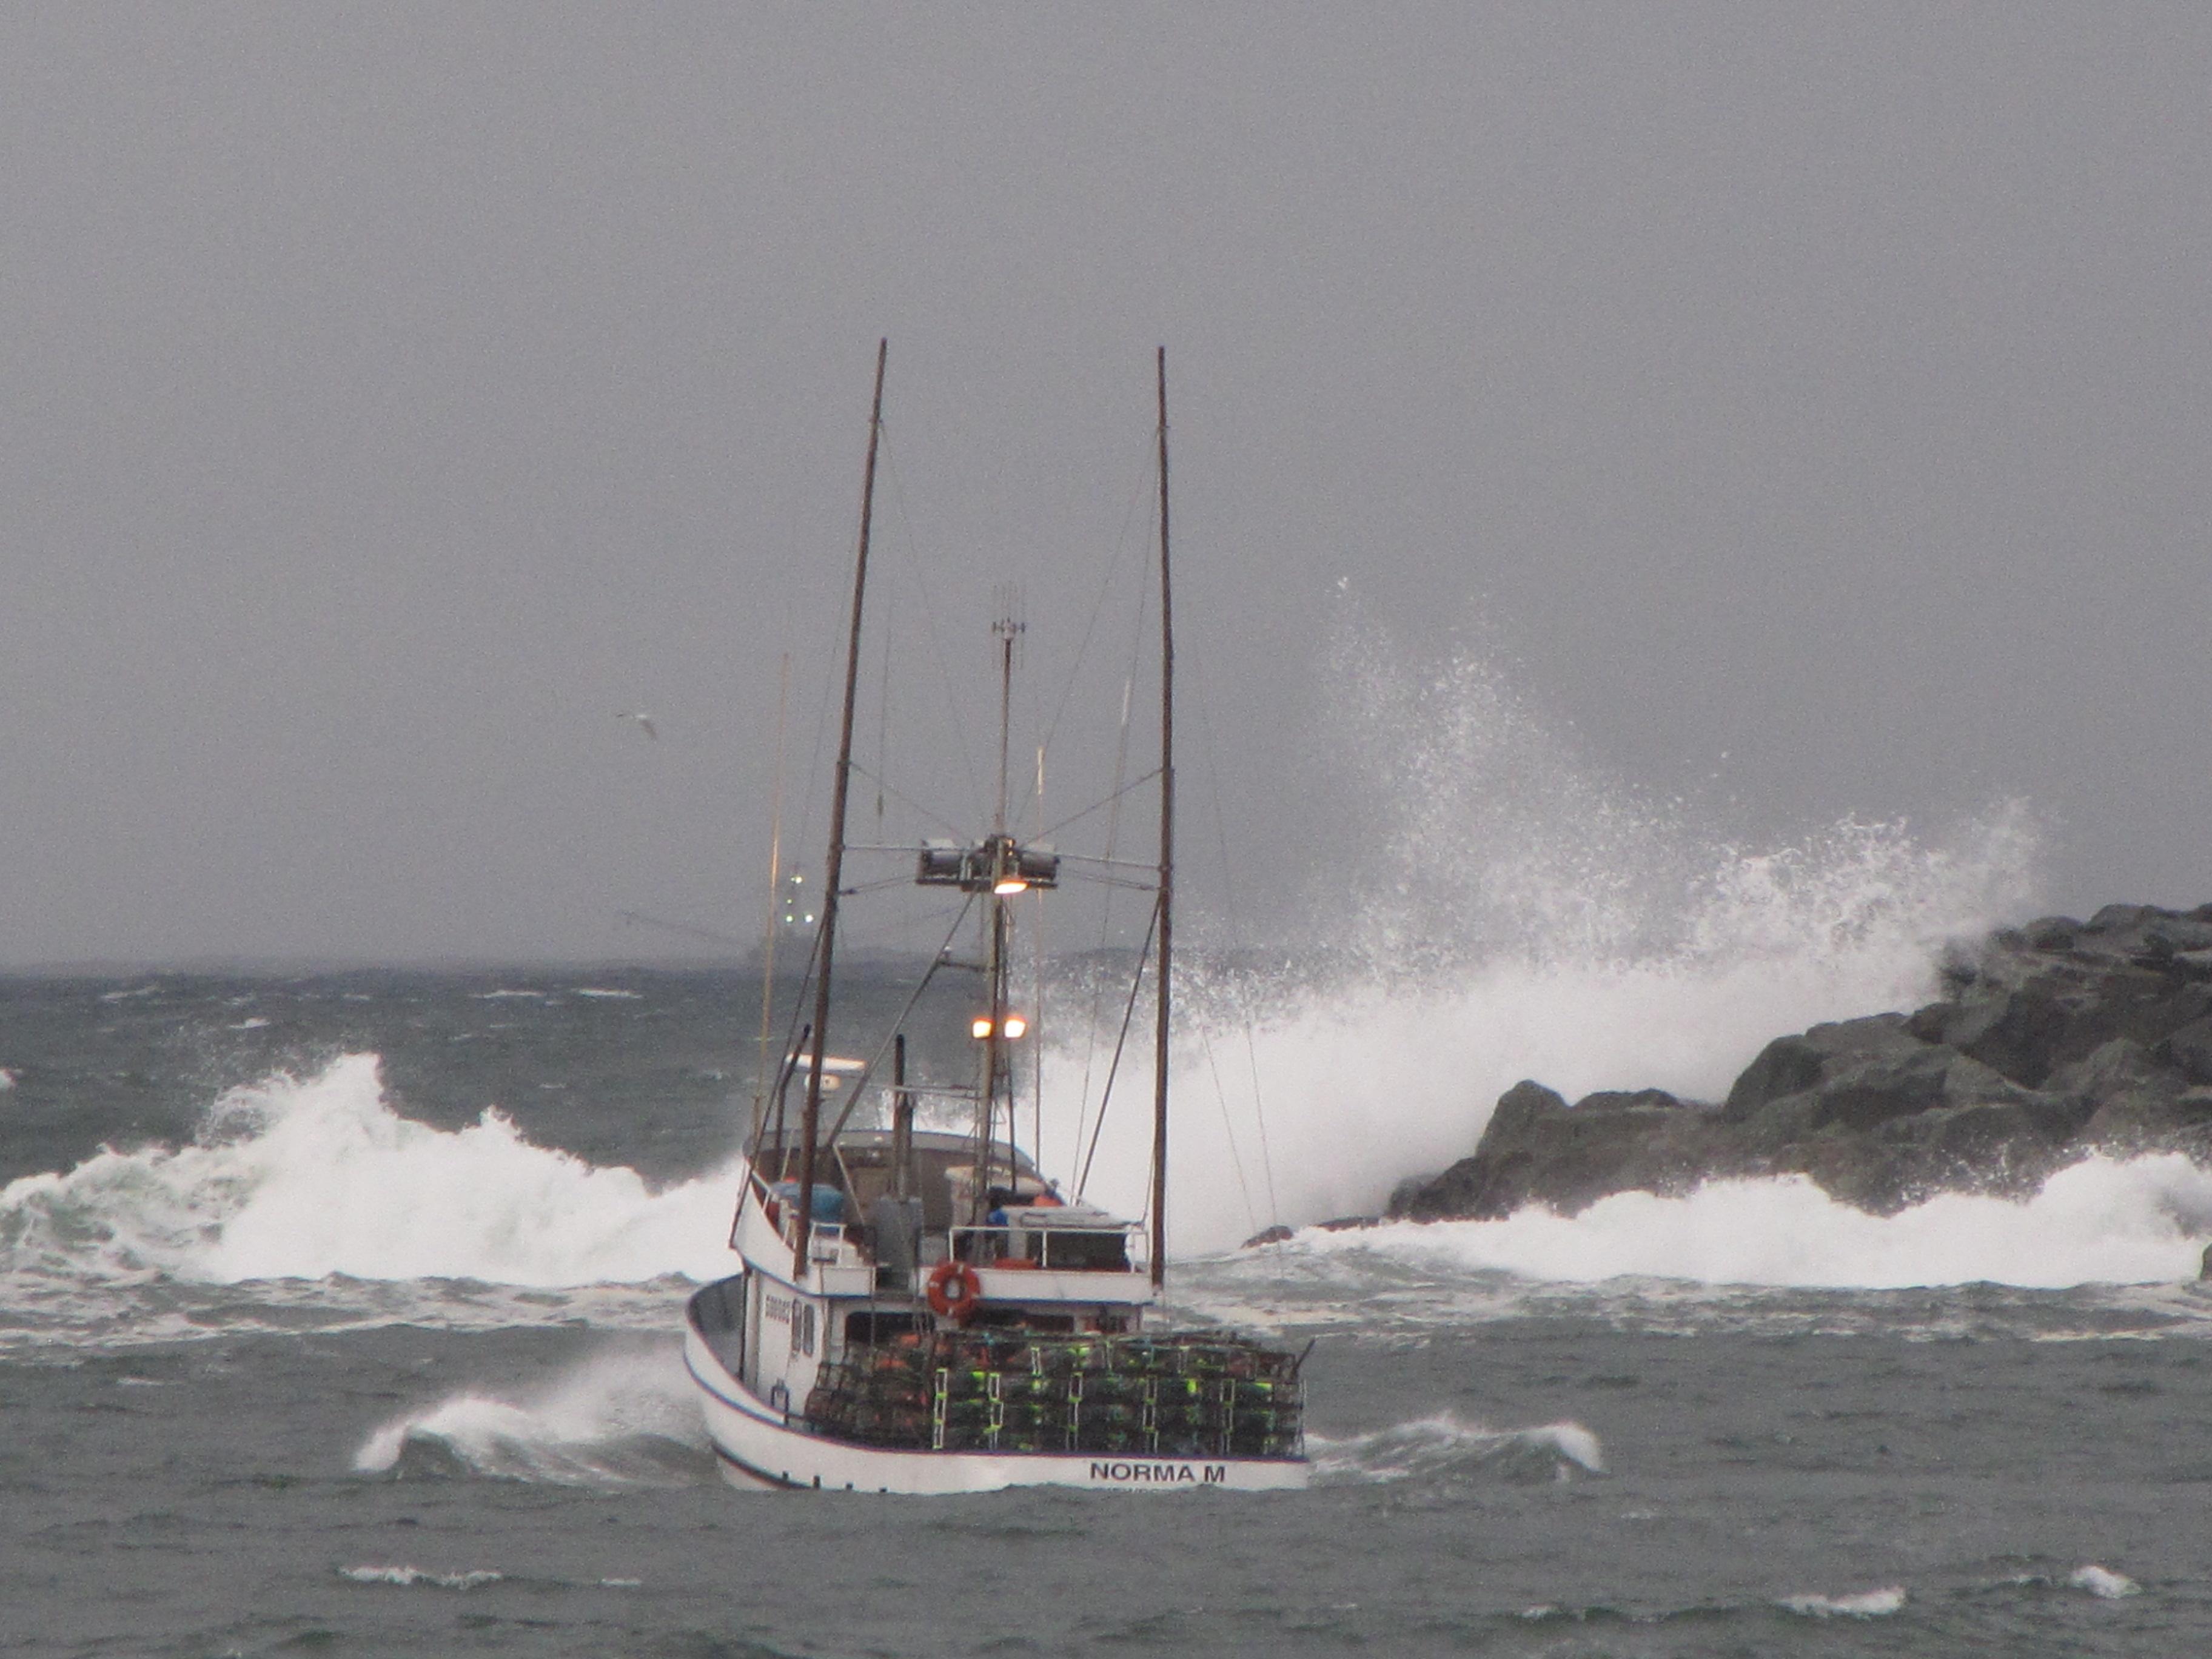 Crabbing on the oregon coast   scod.com